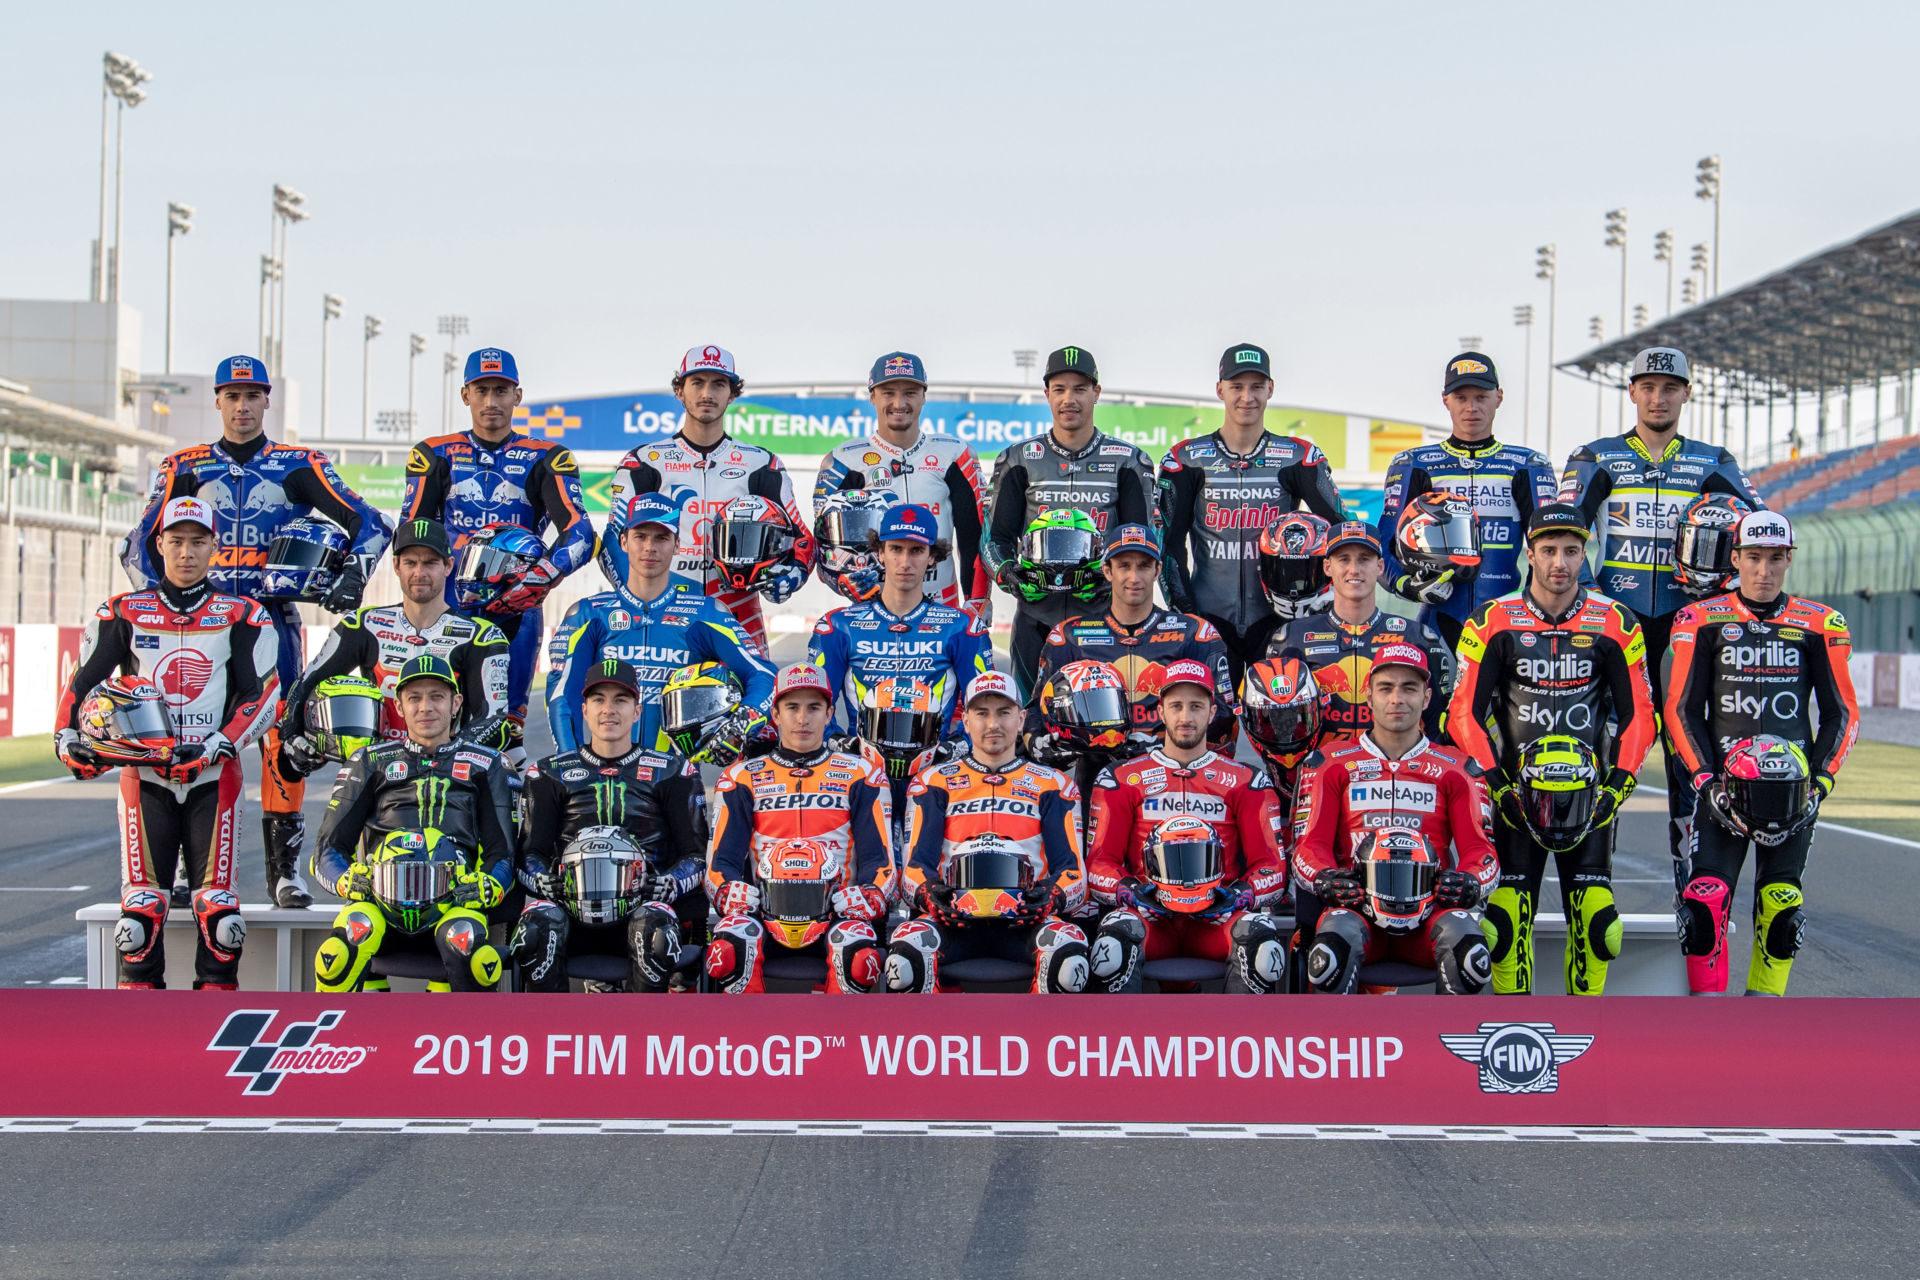 The 2019 FIM MotoGP World Championship field. Photo courtesy of Dorna.